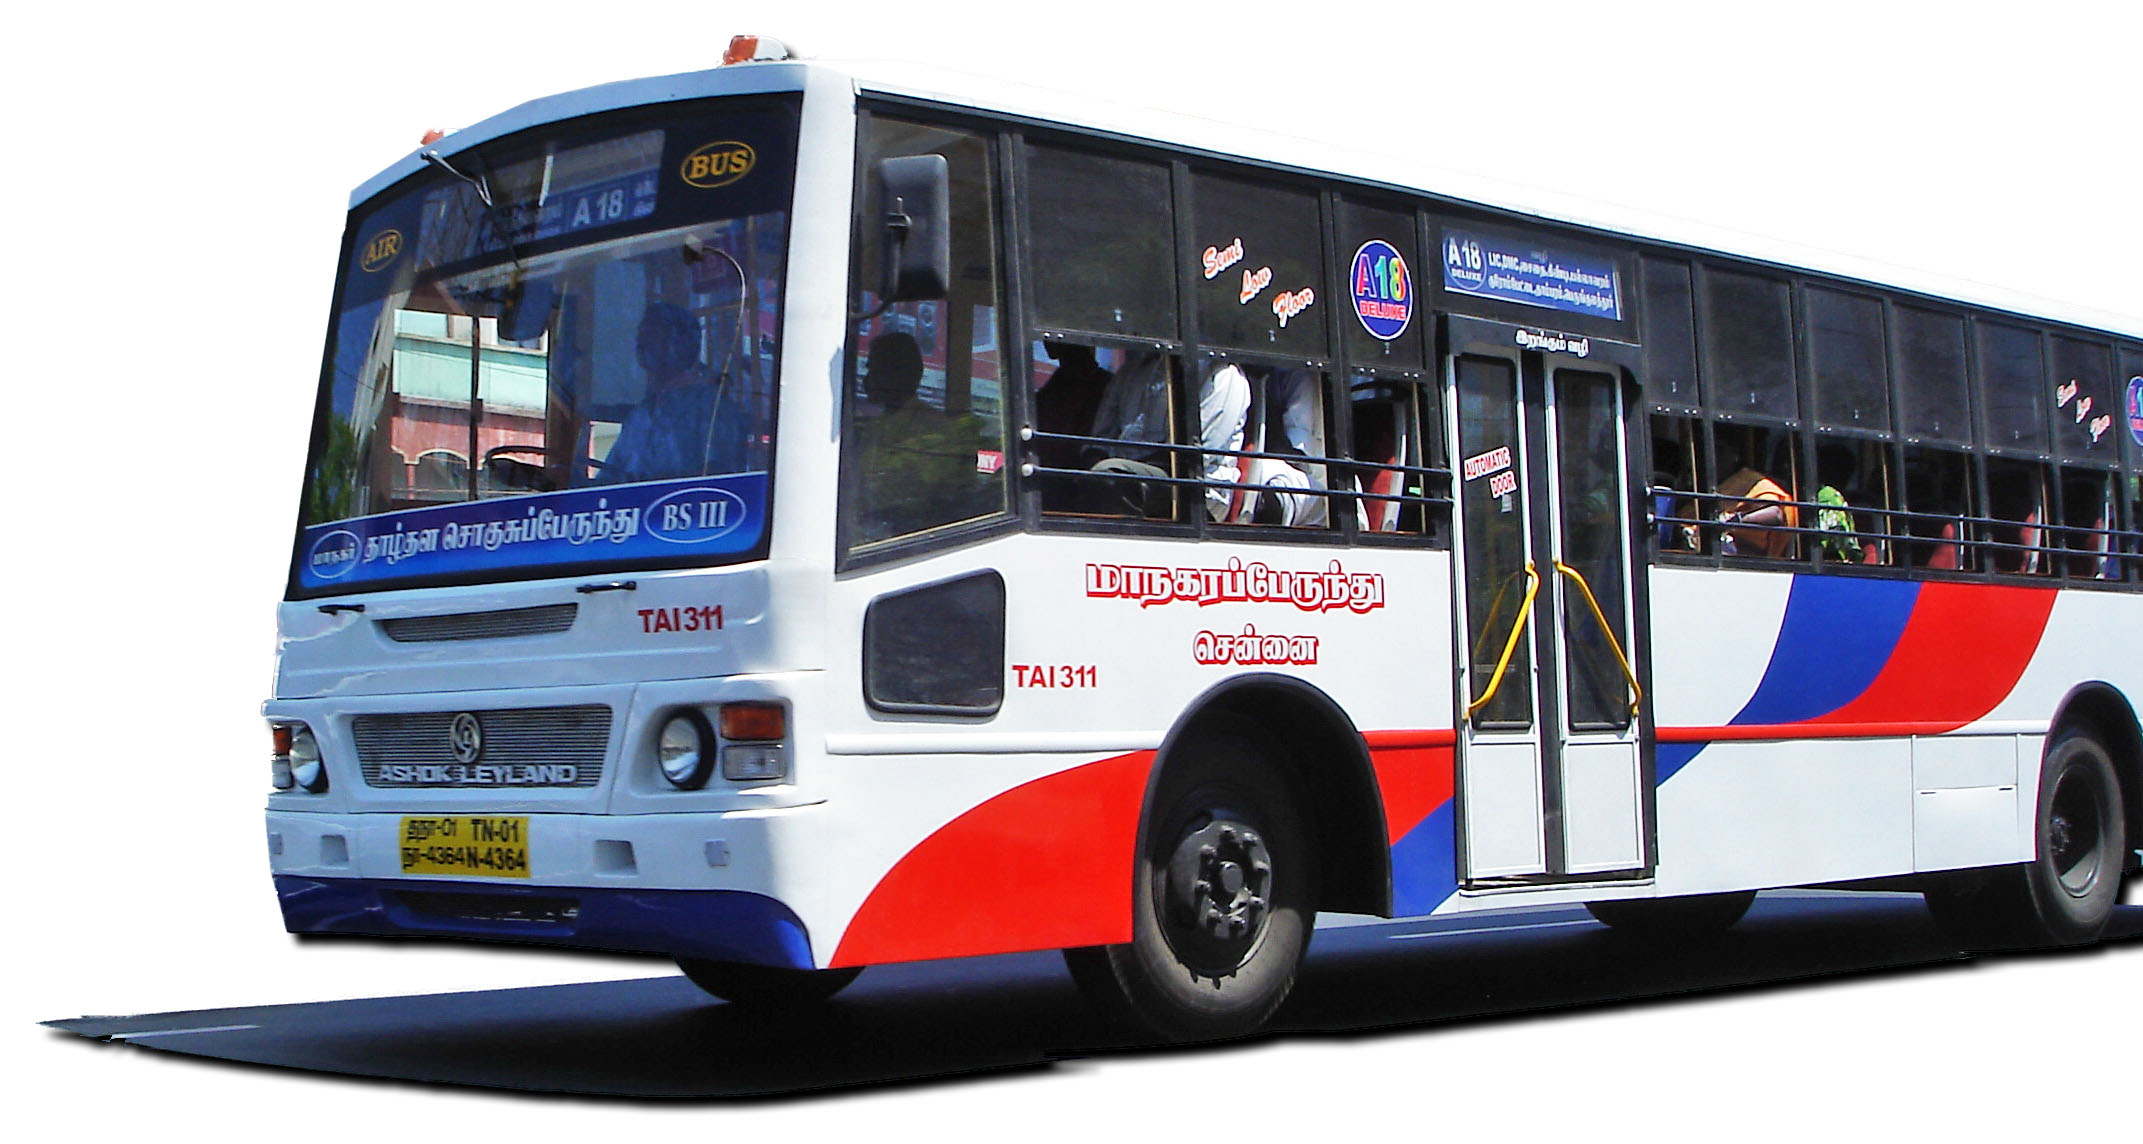 Bus Tour Of The Bronx